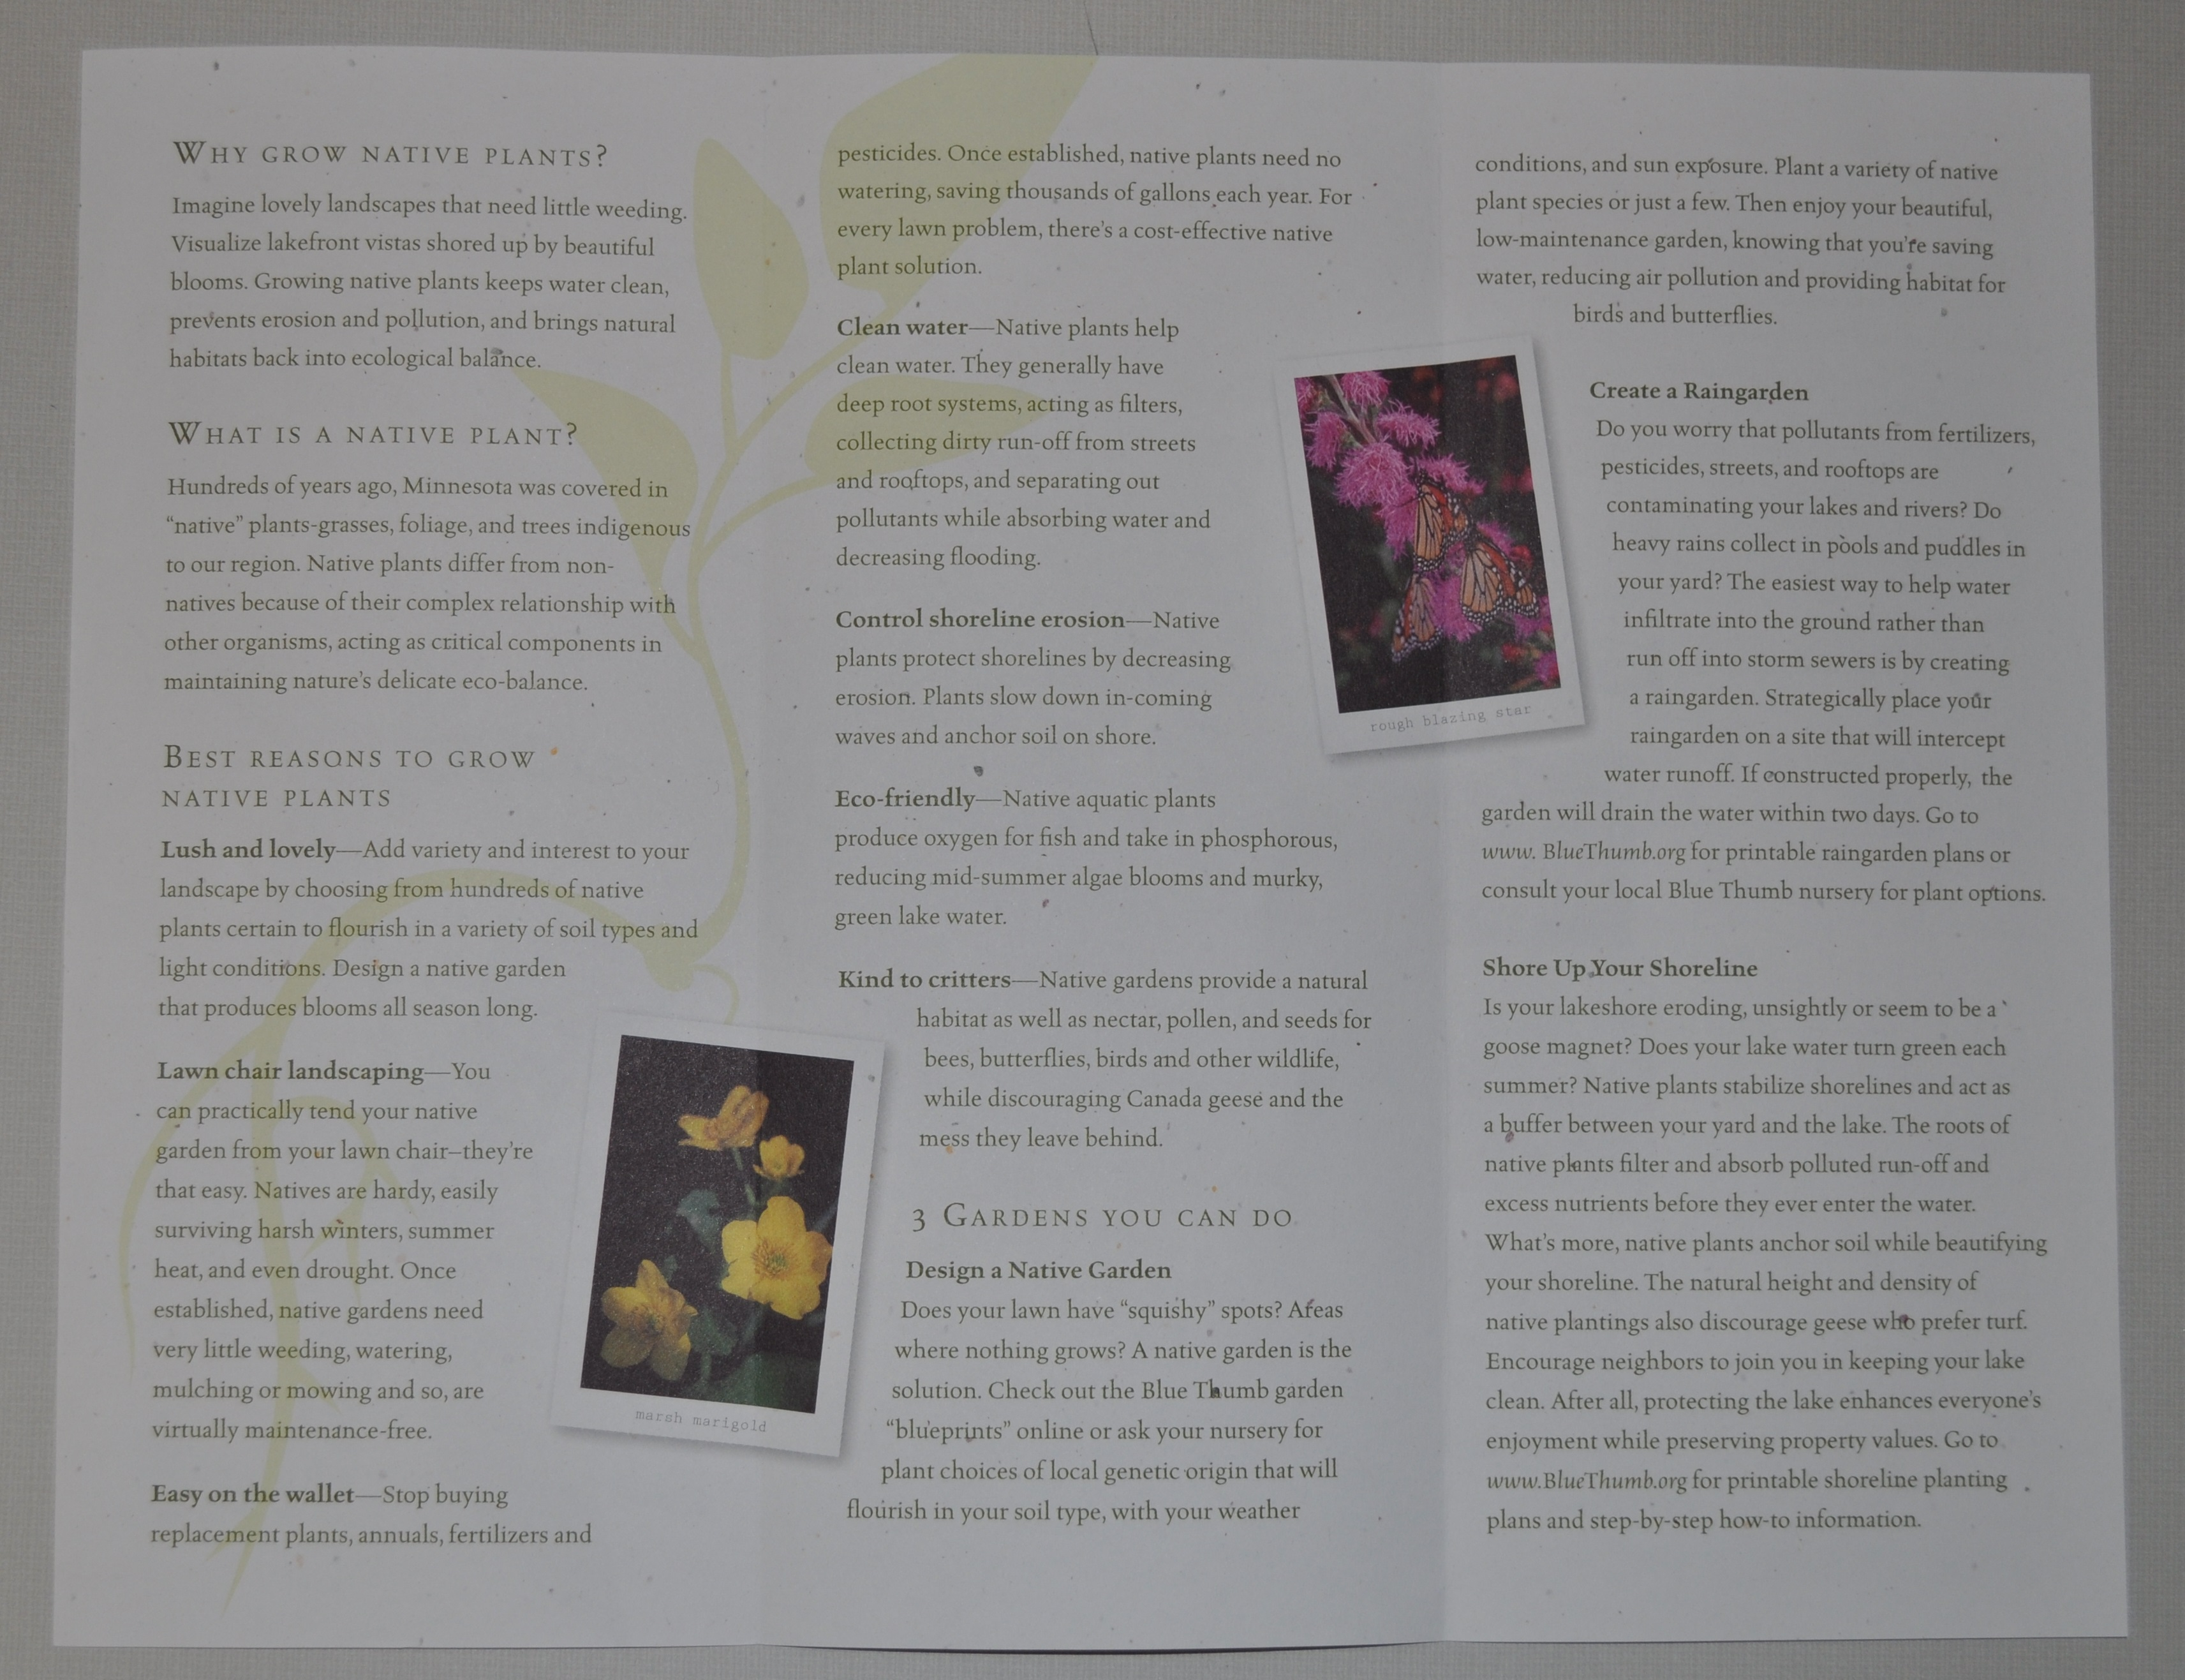 secrets of leisurely landscaping brochure inside